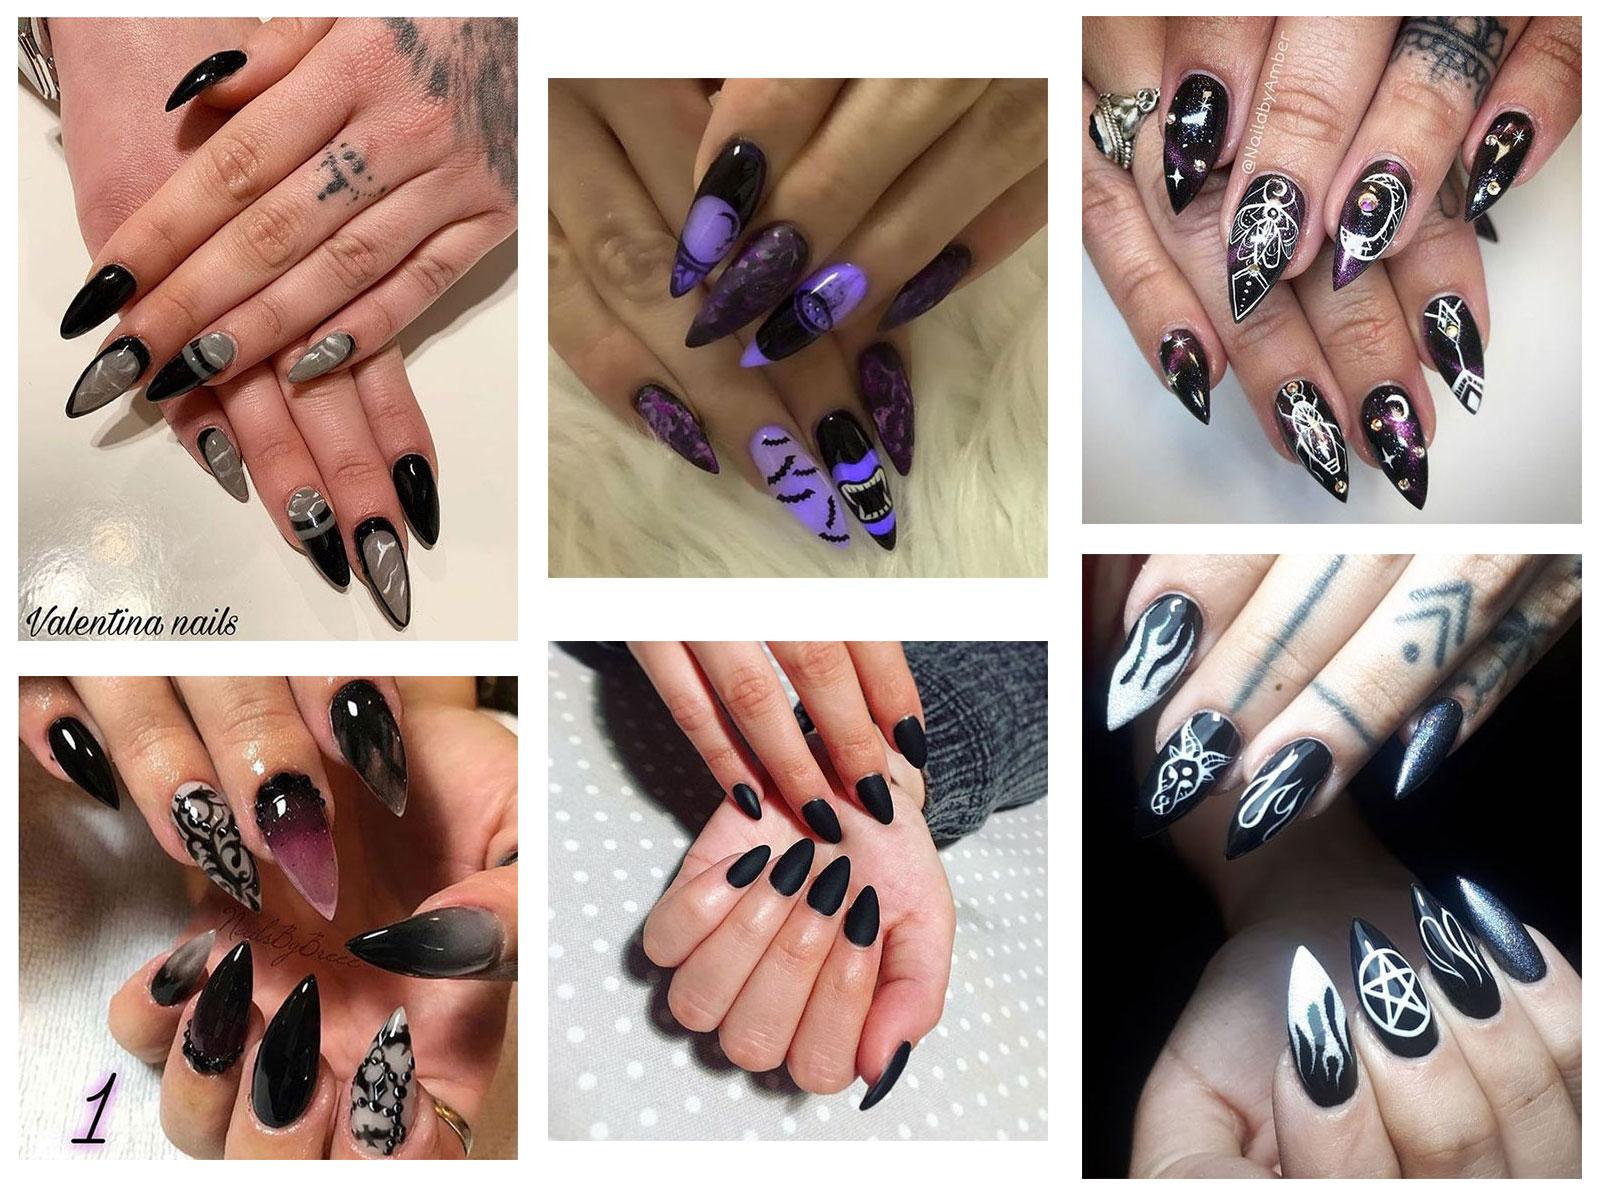 25 Horror \u0026 Scary Halloween Witch Nails Art Designs \u0026 Ideas